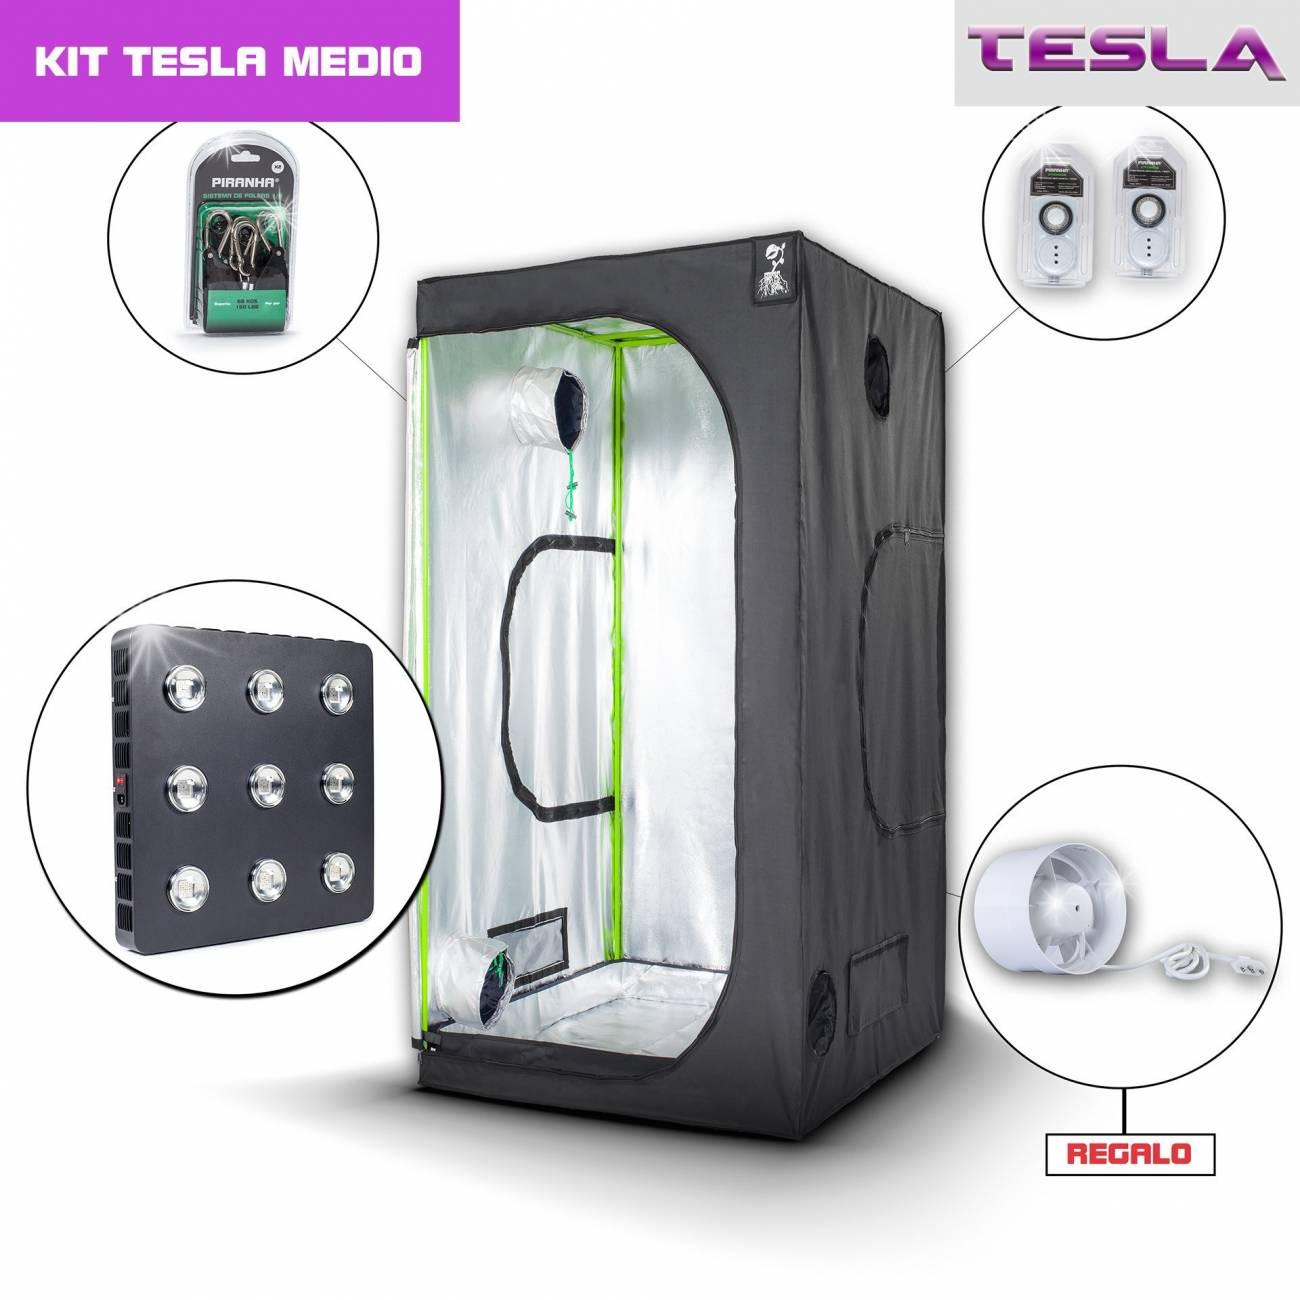 Kit Tesla 100 - T810W Medio